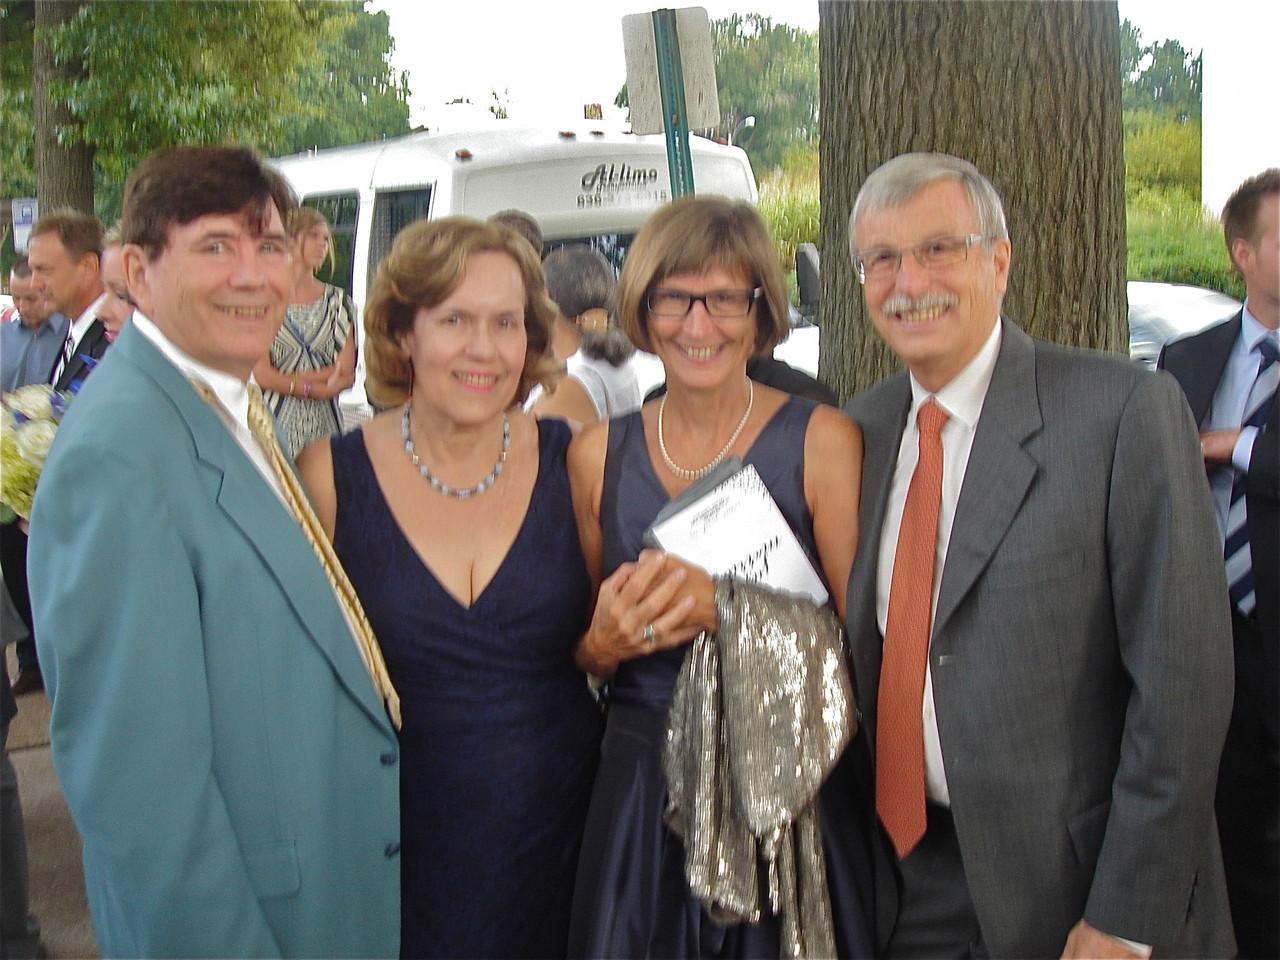 John Wagner, Lorraine Gudas, Jill & Antonio